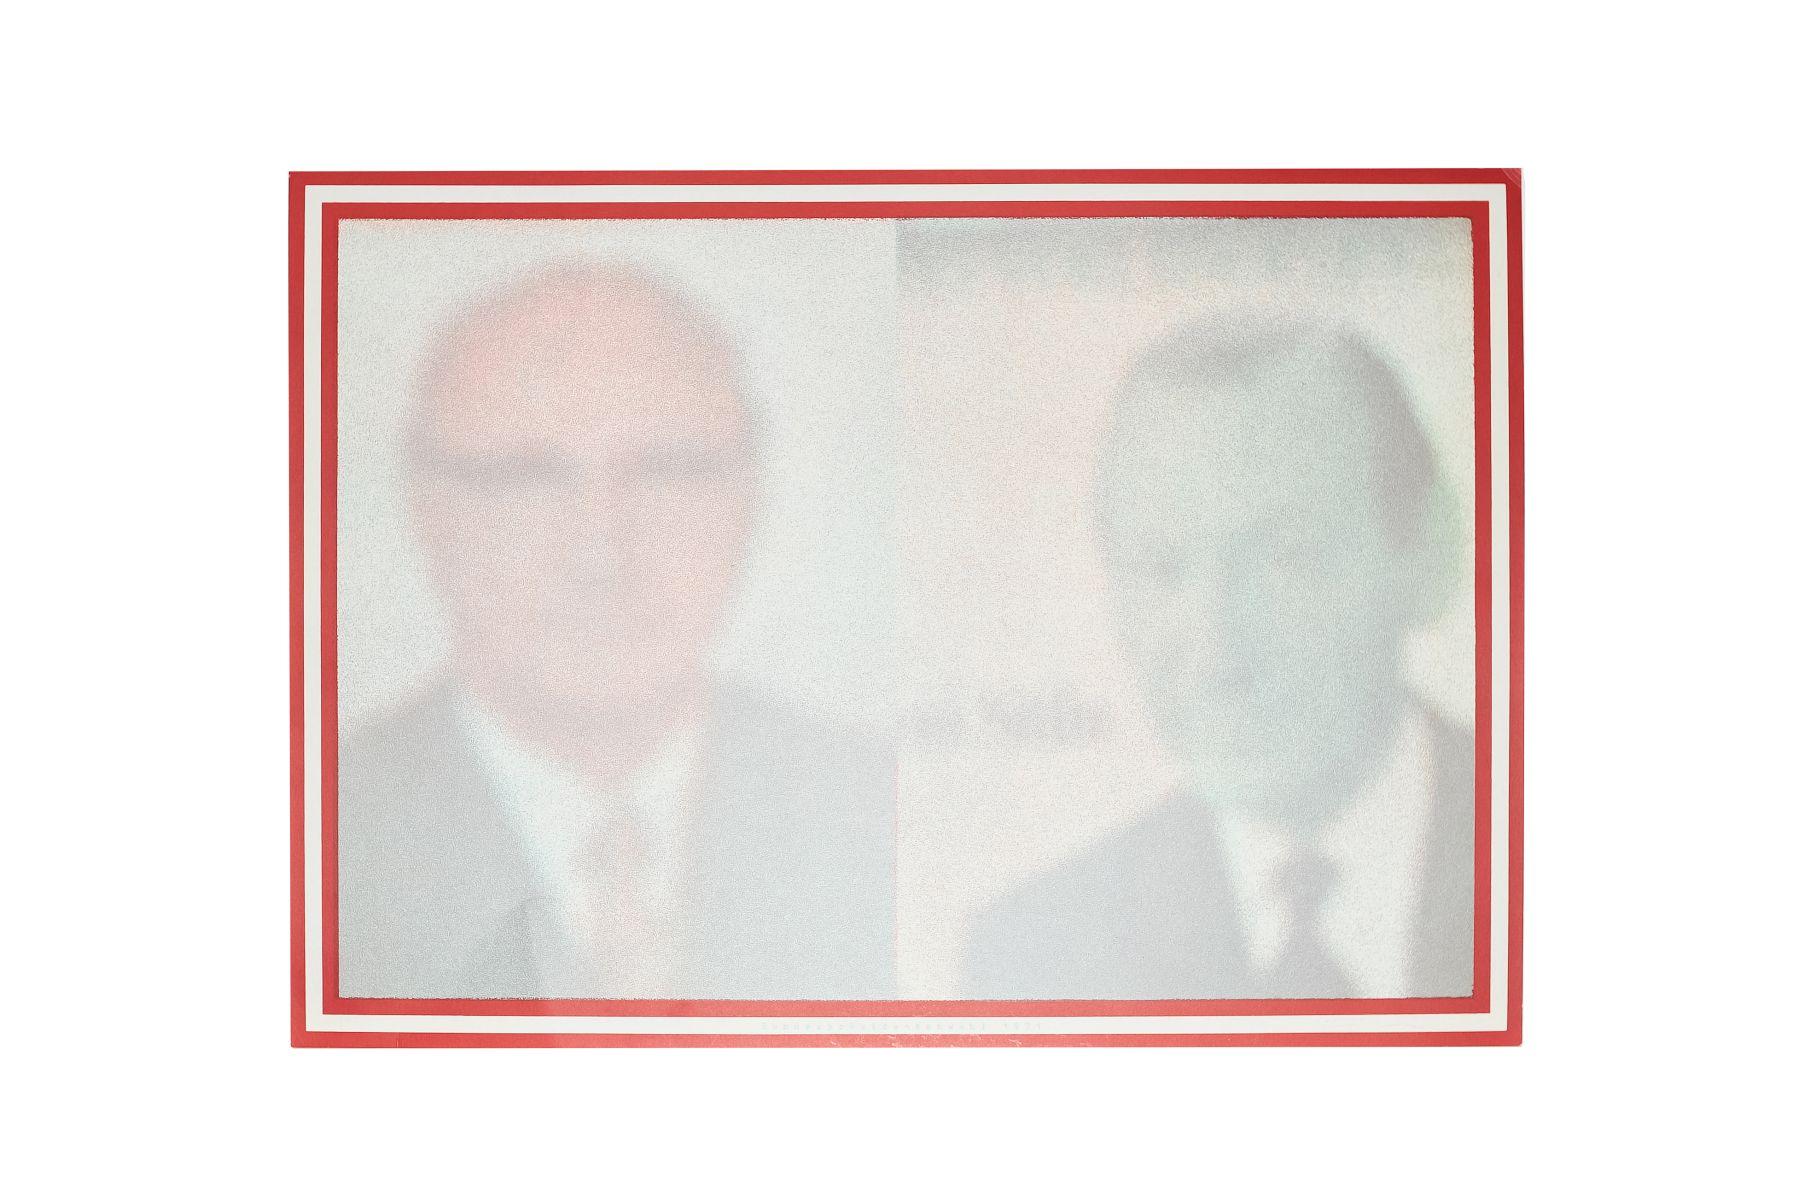 "#93 Erich Thorn ""Federal President"